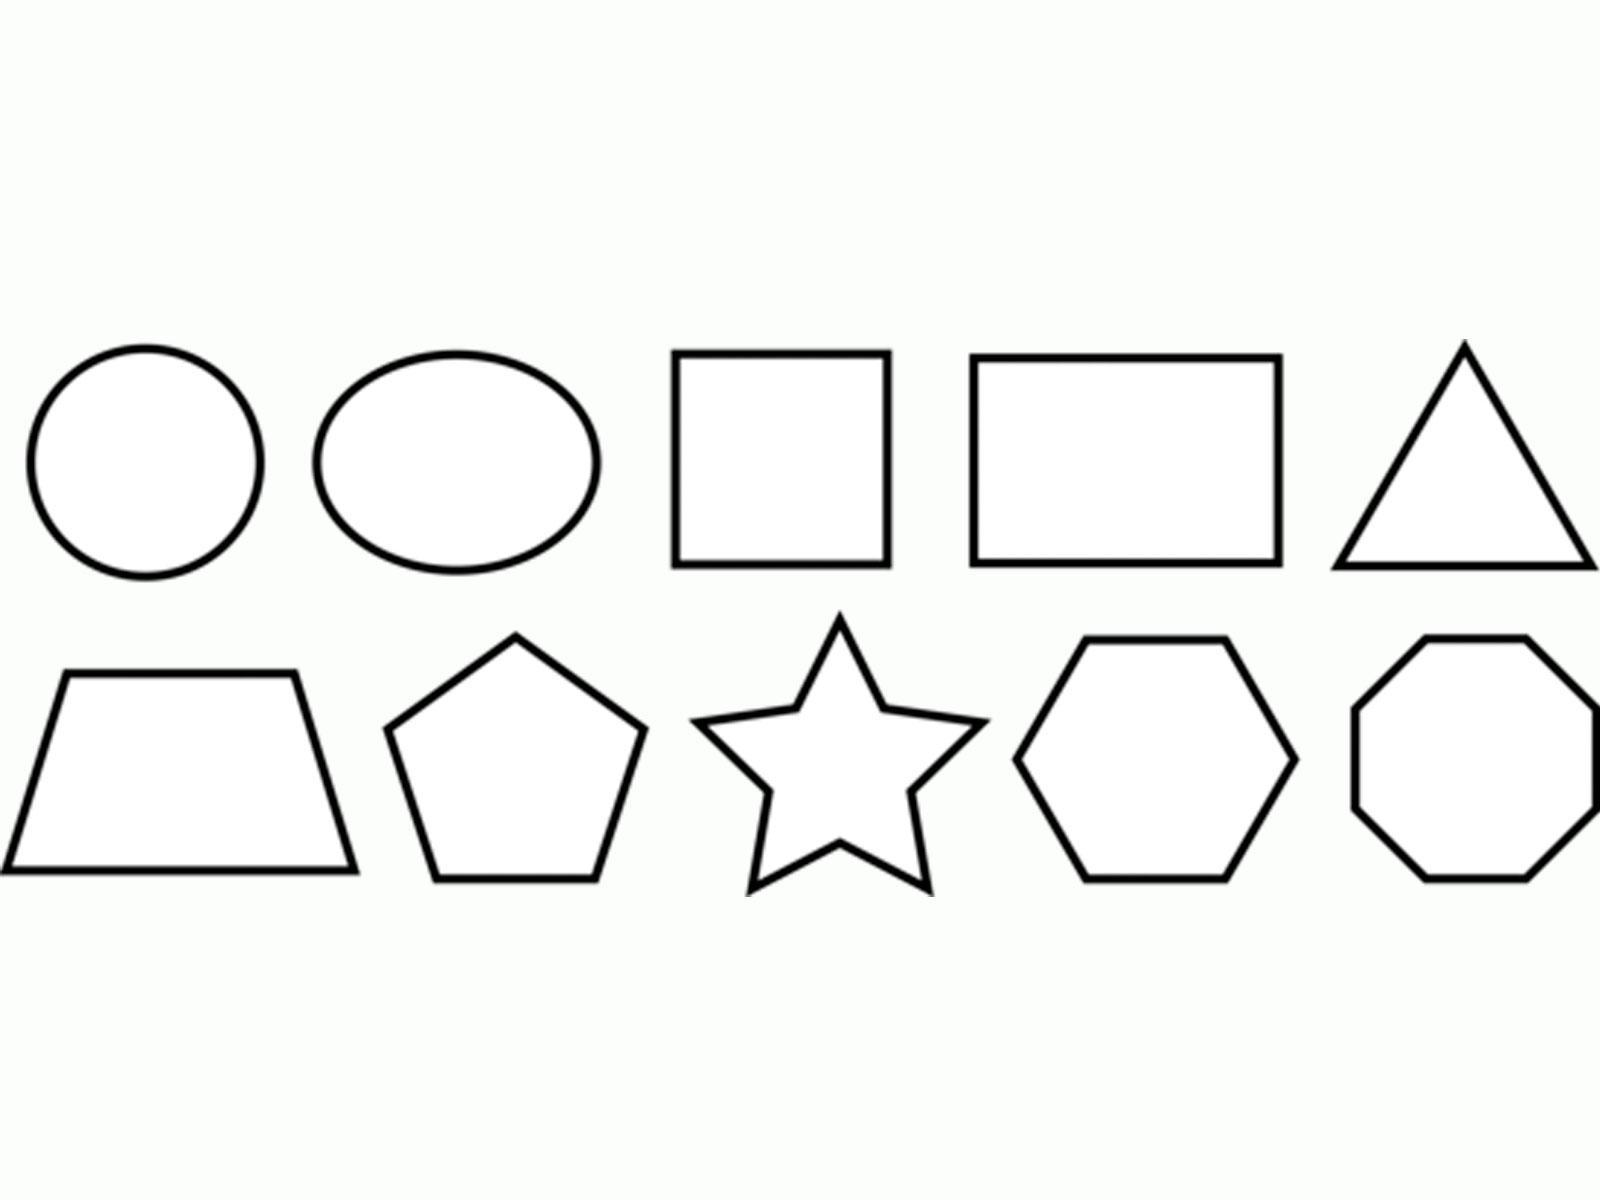 Раскраски фигуры, круг, овал, квадрат